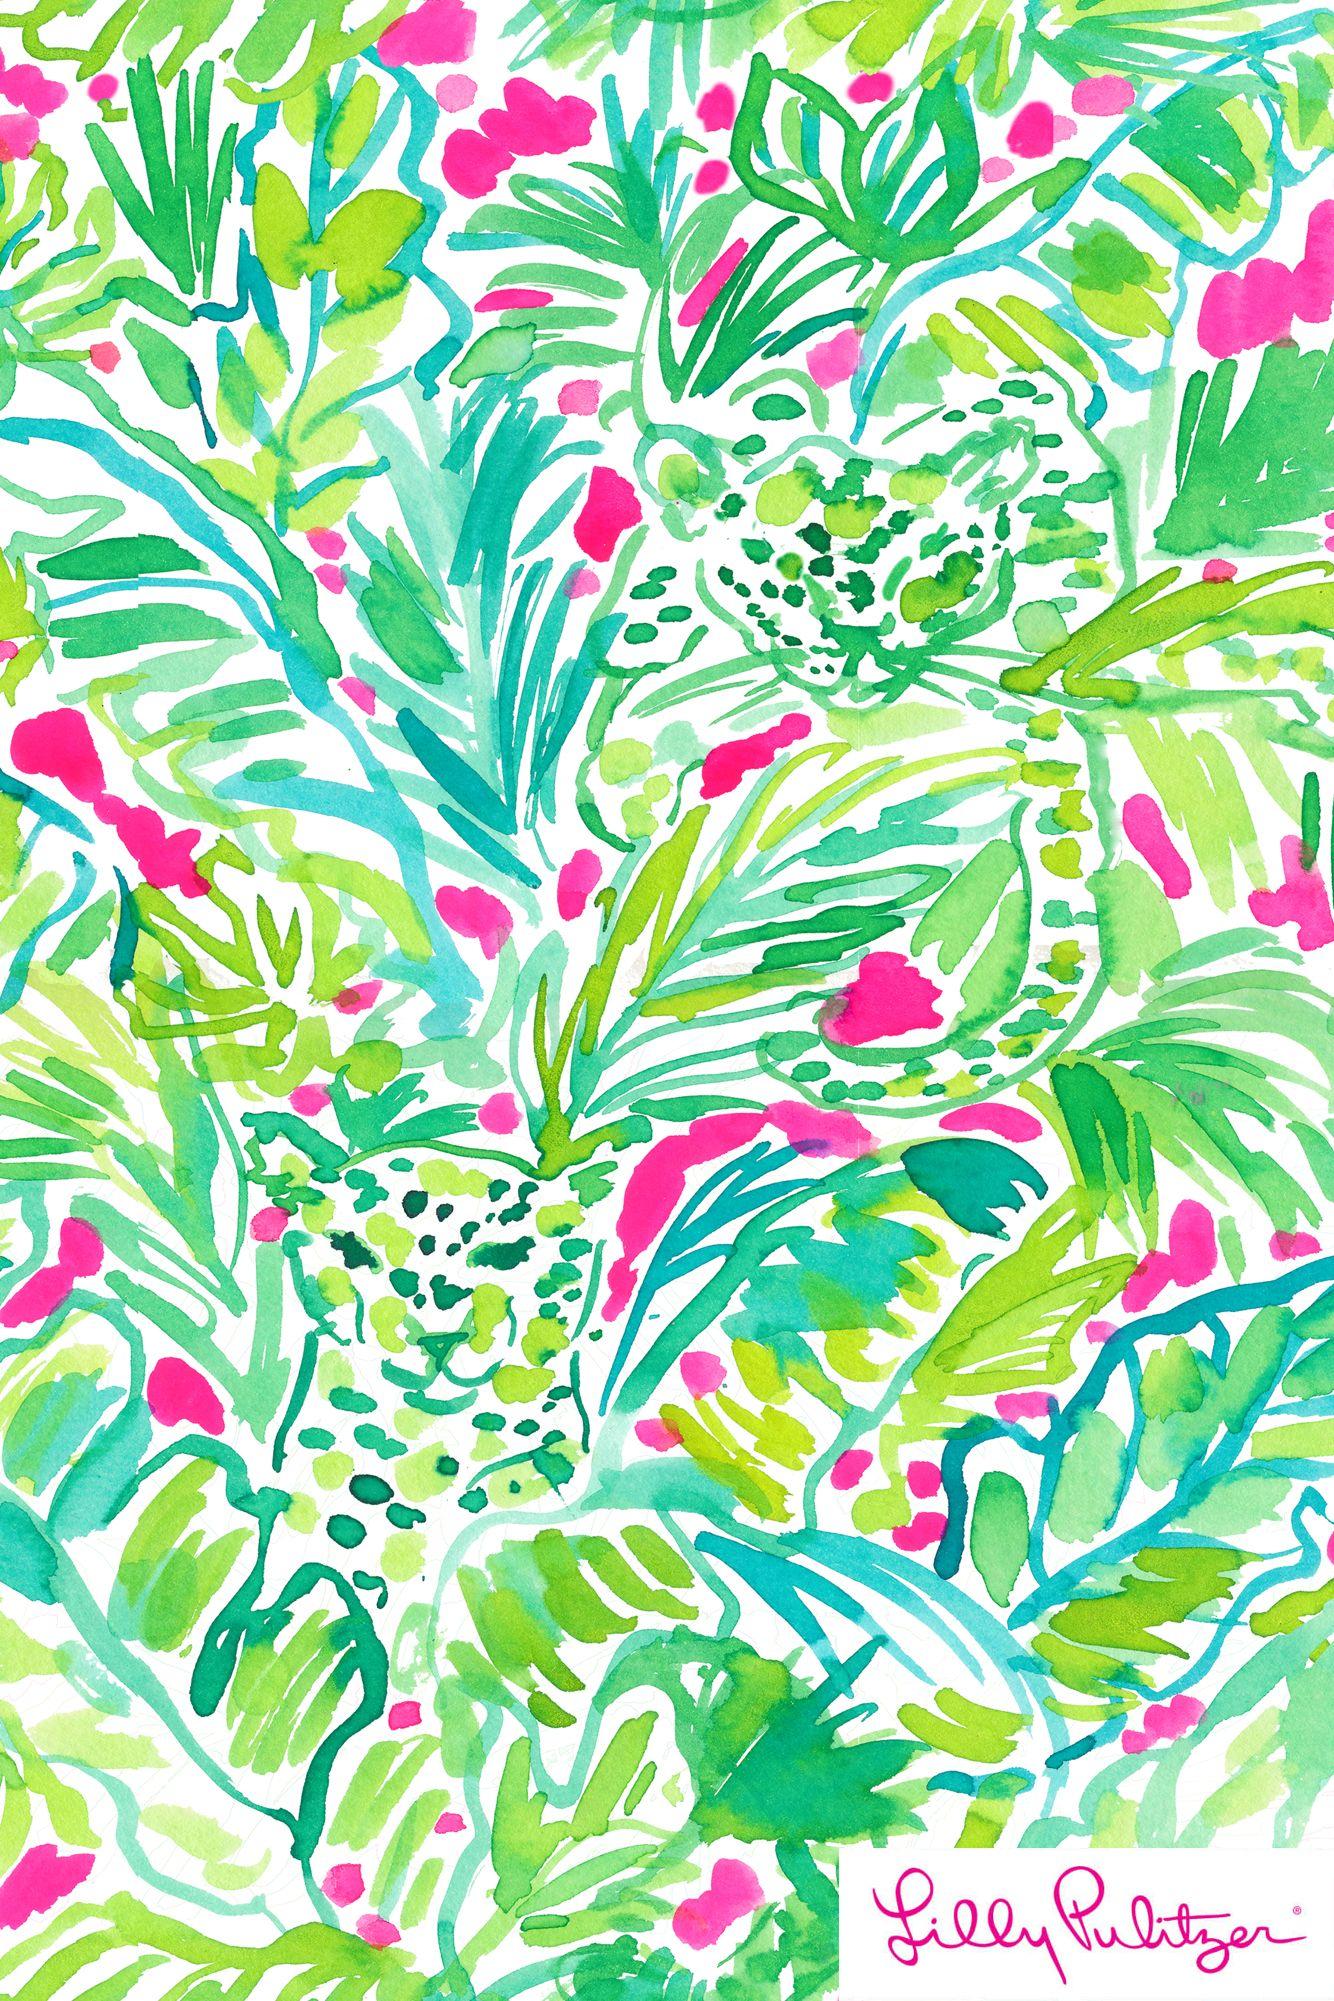 Palm Beach Jungle Lilly Pulitzer X Starbucks 2017